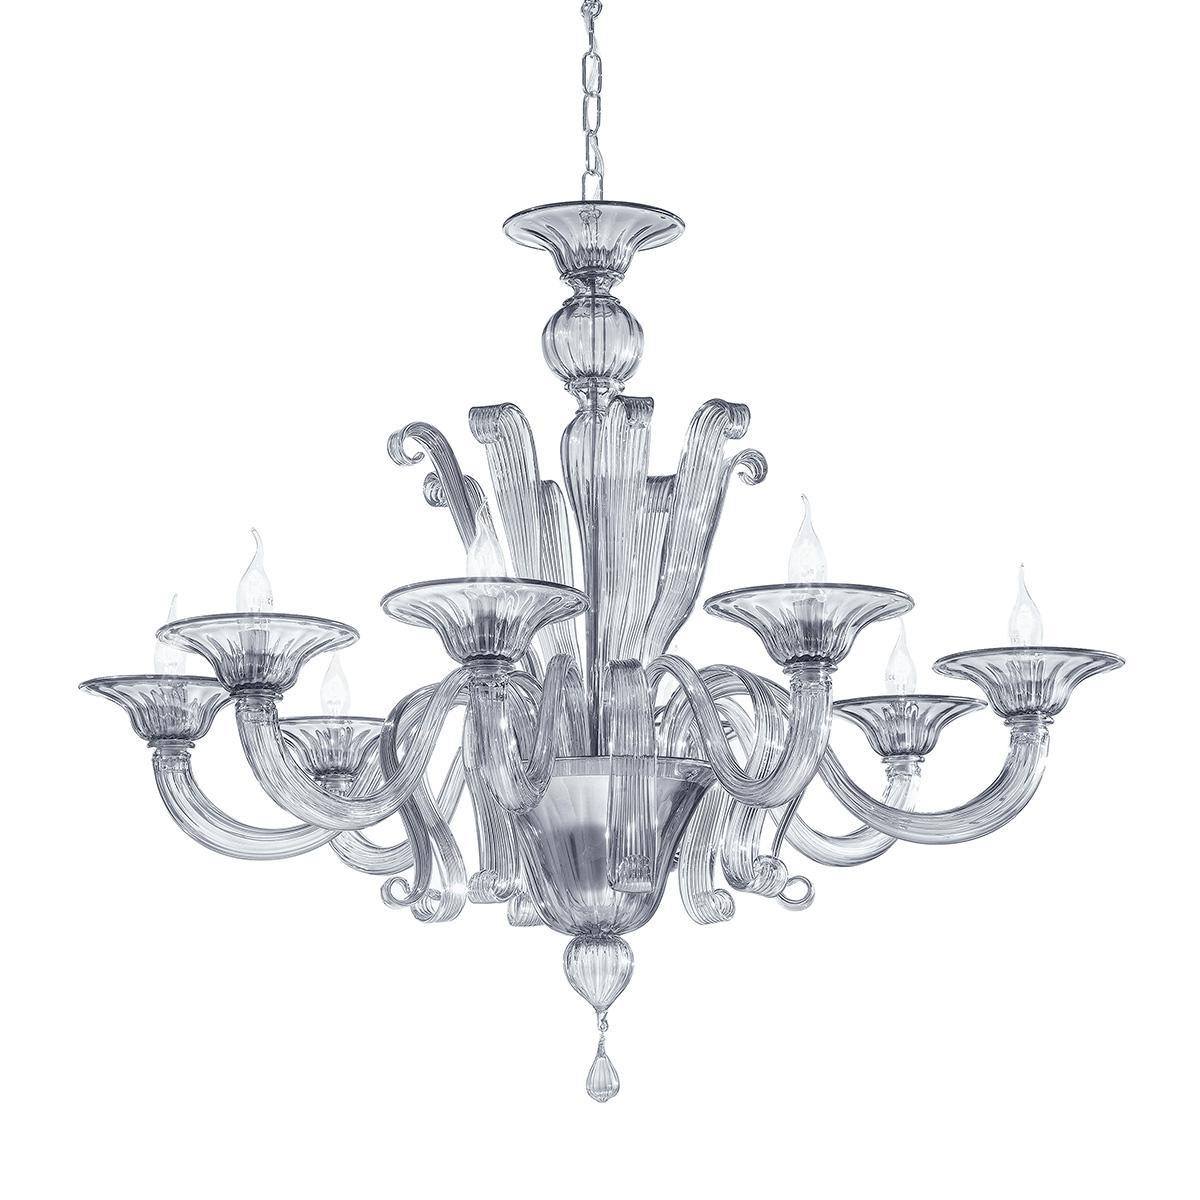 """Marinella"" lustre en cristal de Murano - 8 lumières - fumée"